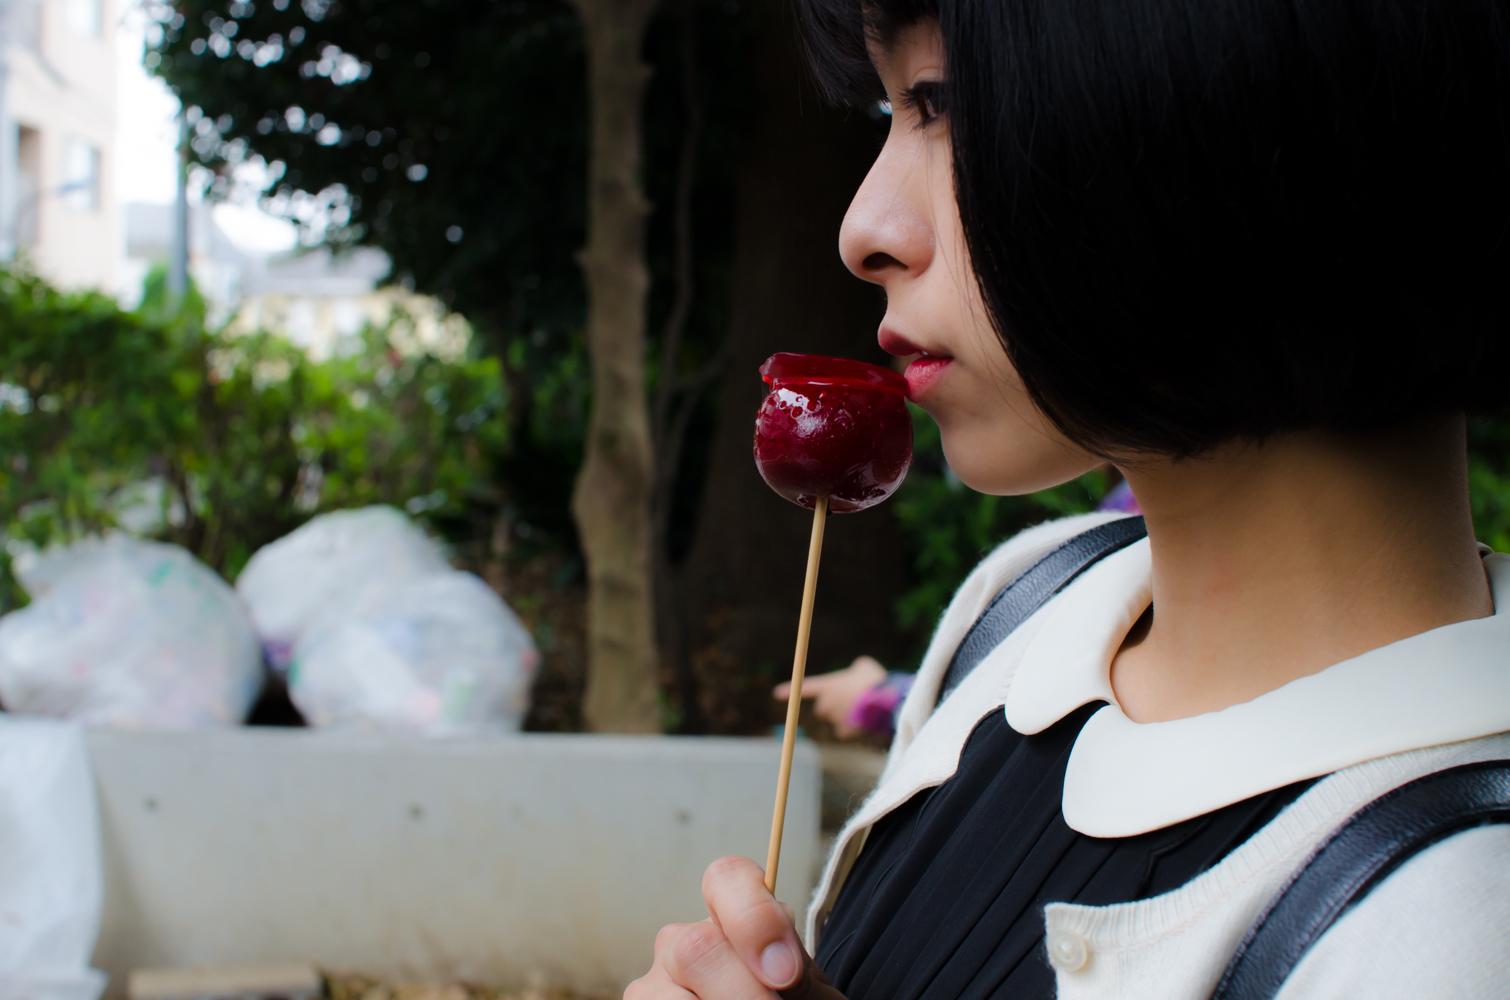 manaco_sakura-1.jpg